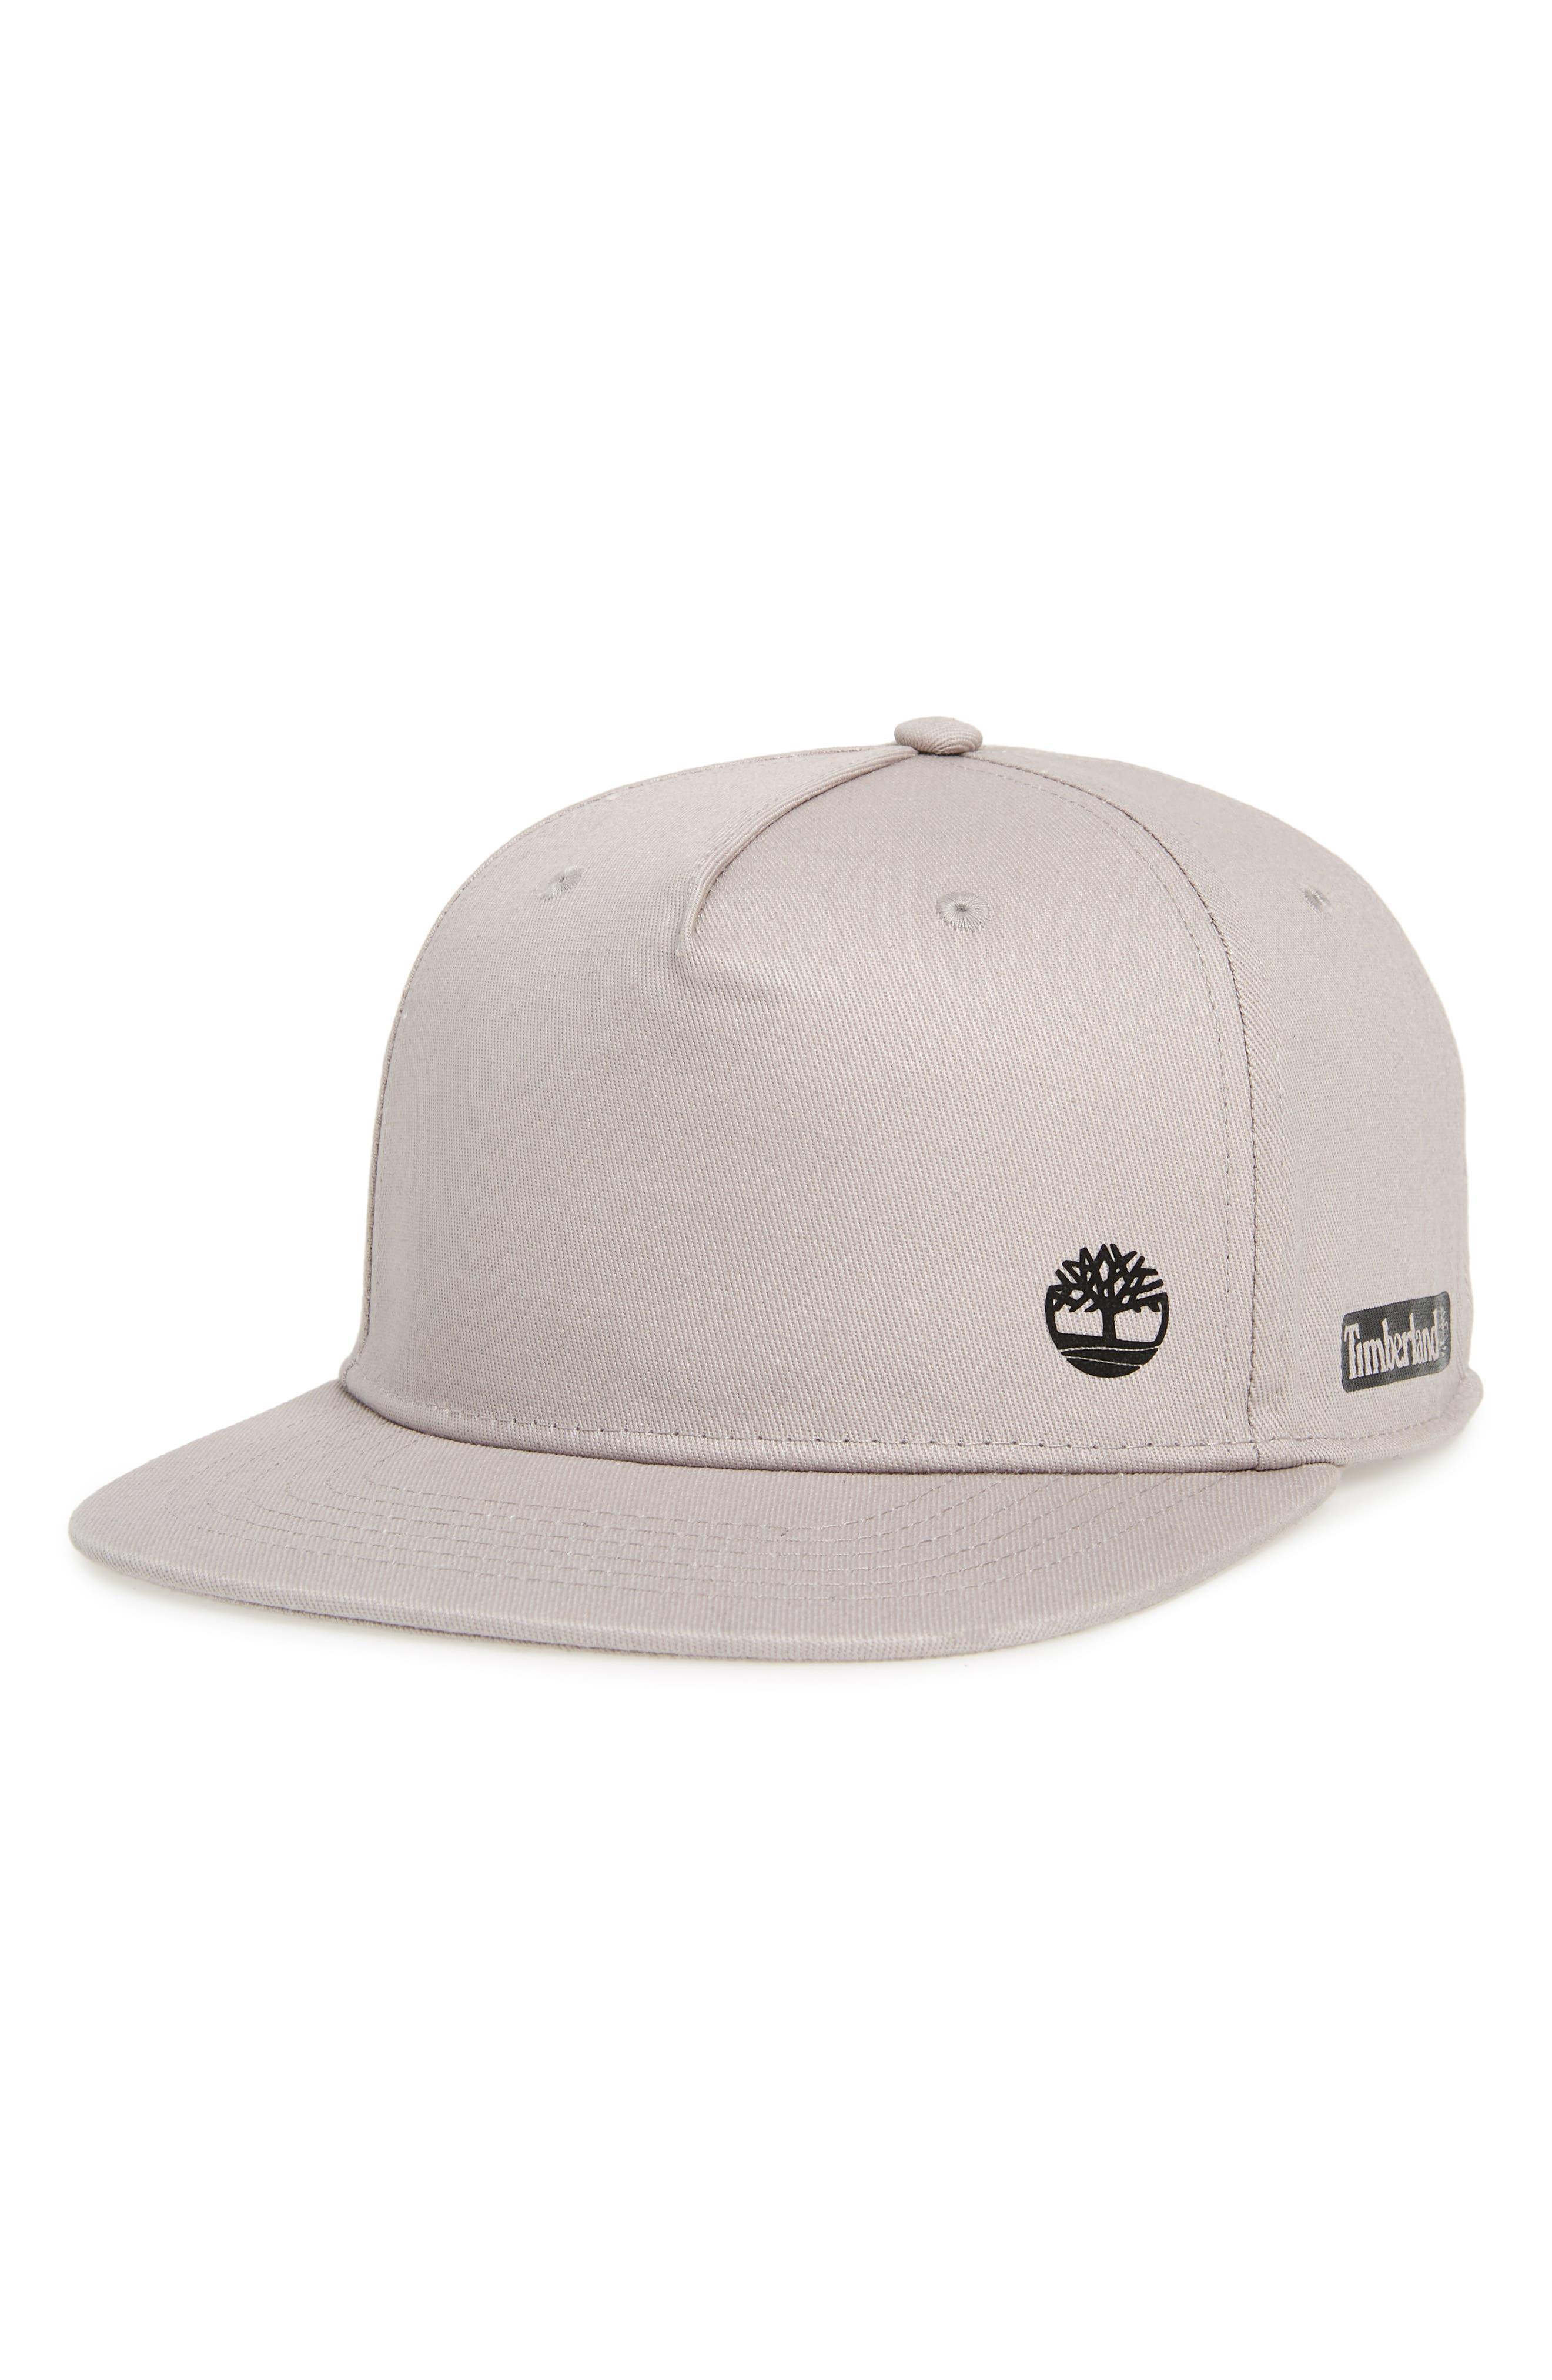 Castle Hill Baseball Cap,                         Main,                         color, Light Grey